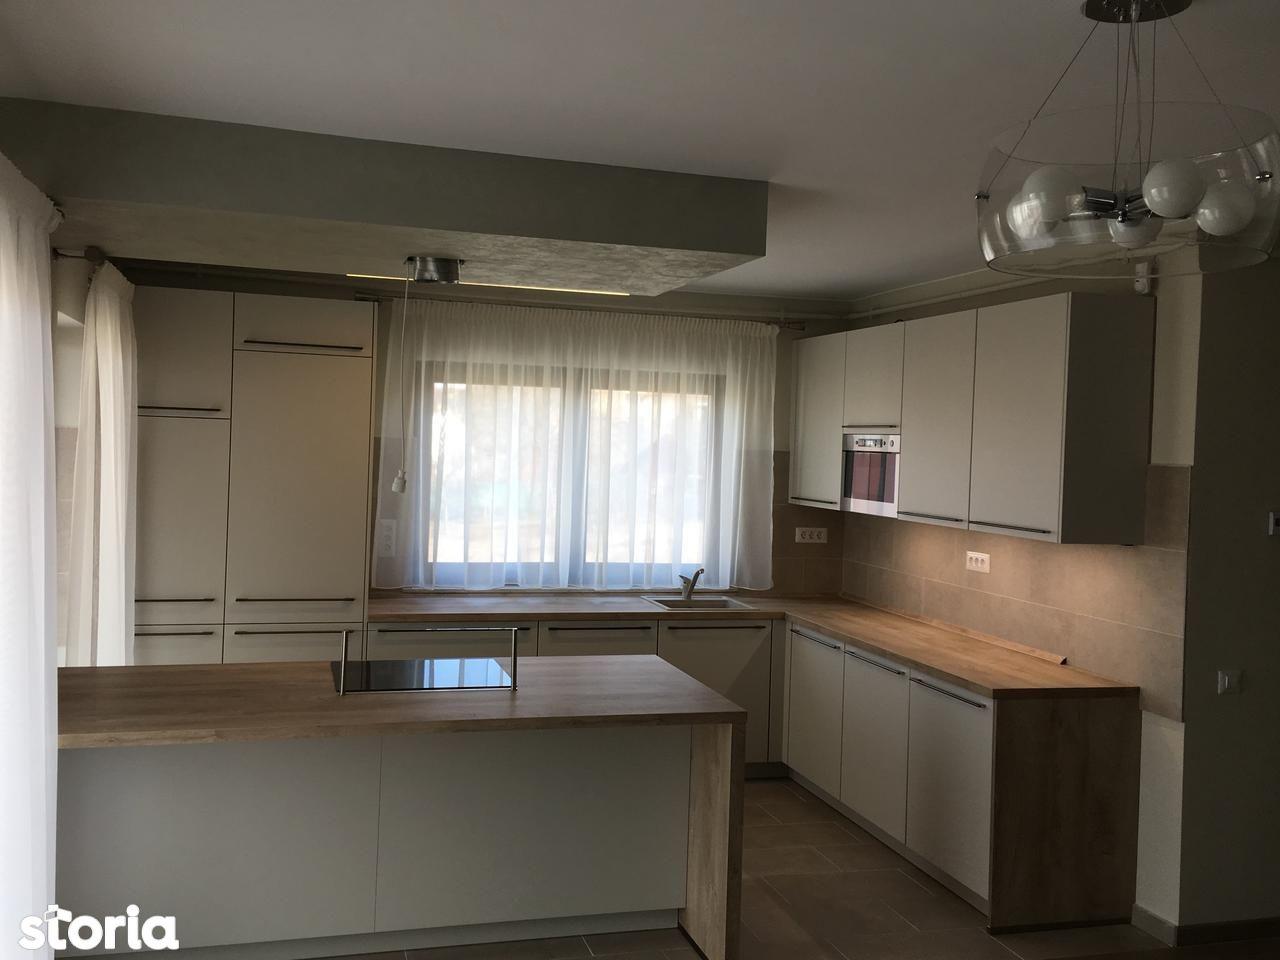 Apartament de inchiriat, Cluj-Napoca, Cluj, Gruia - Foto 1